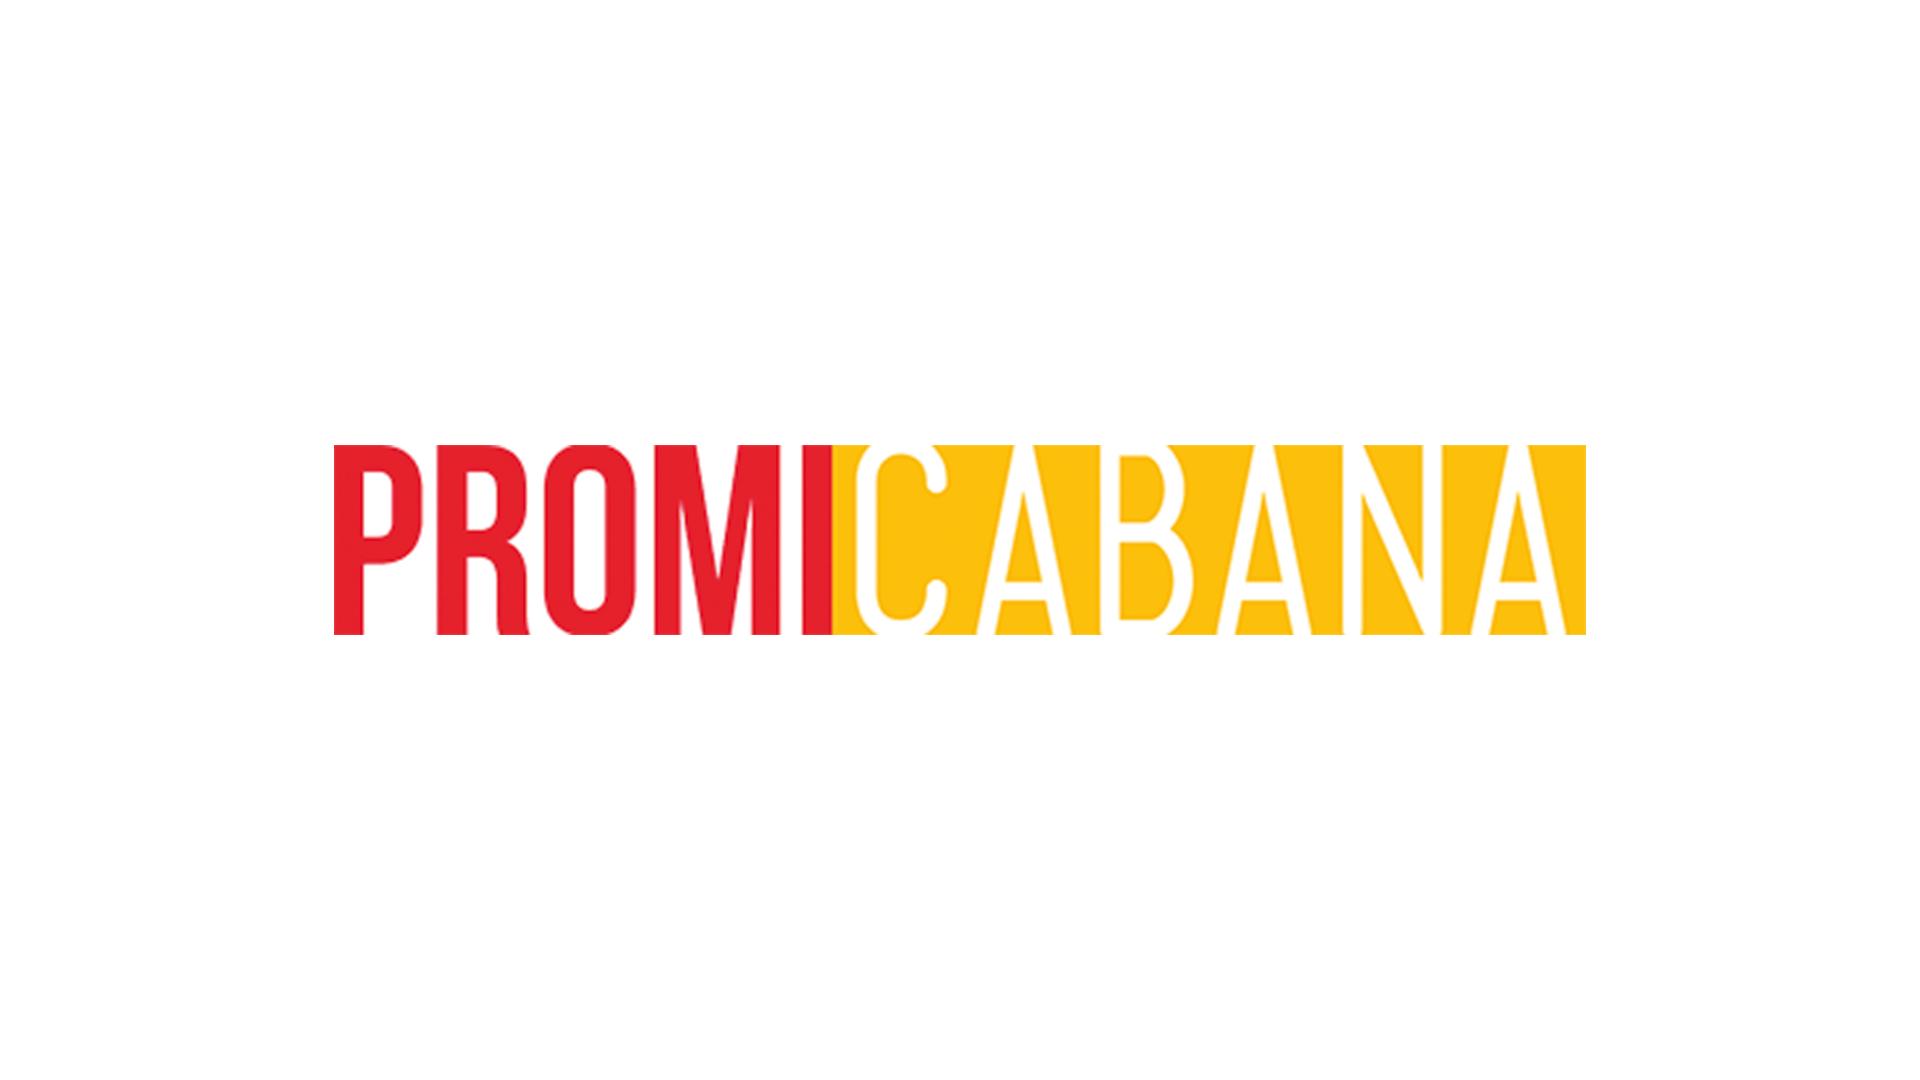 Arrowverse-Crossover-Flash-Supergirl-Arrow-Legends-of-Tomorrow